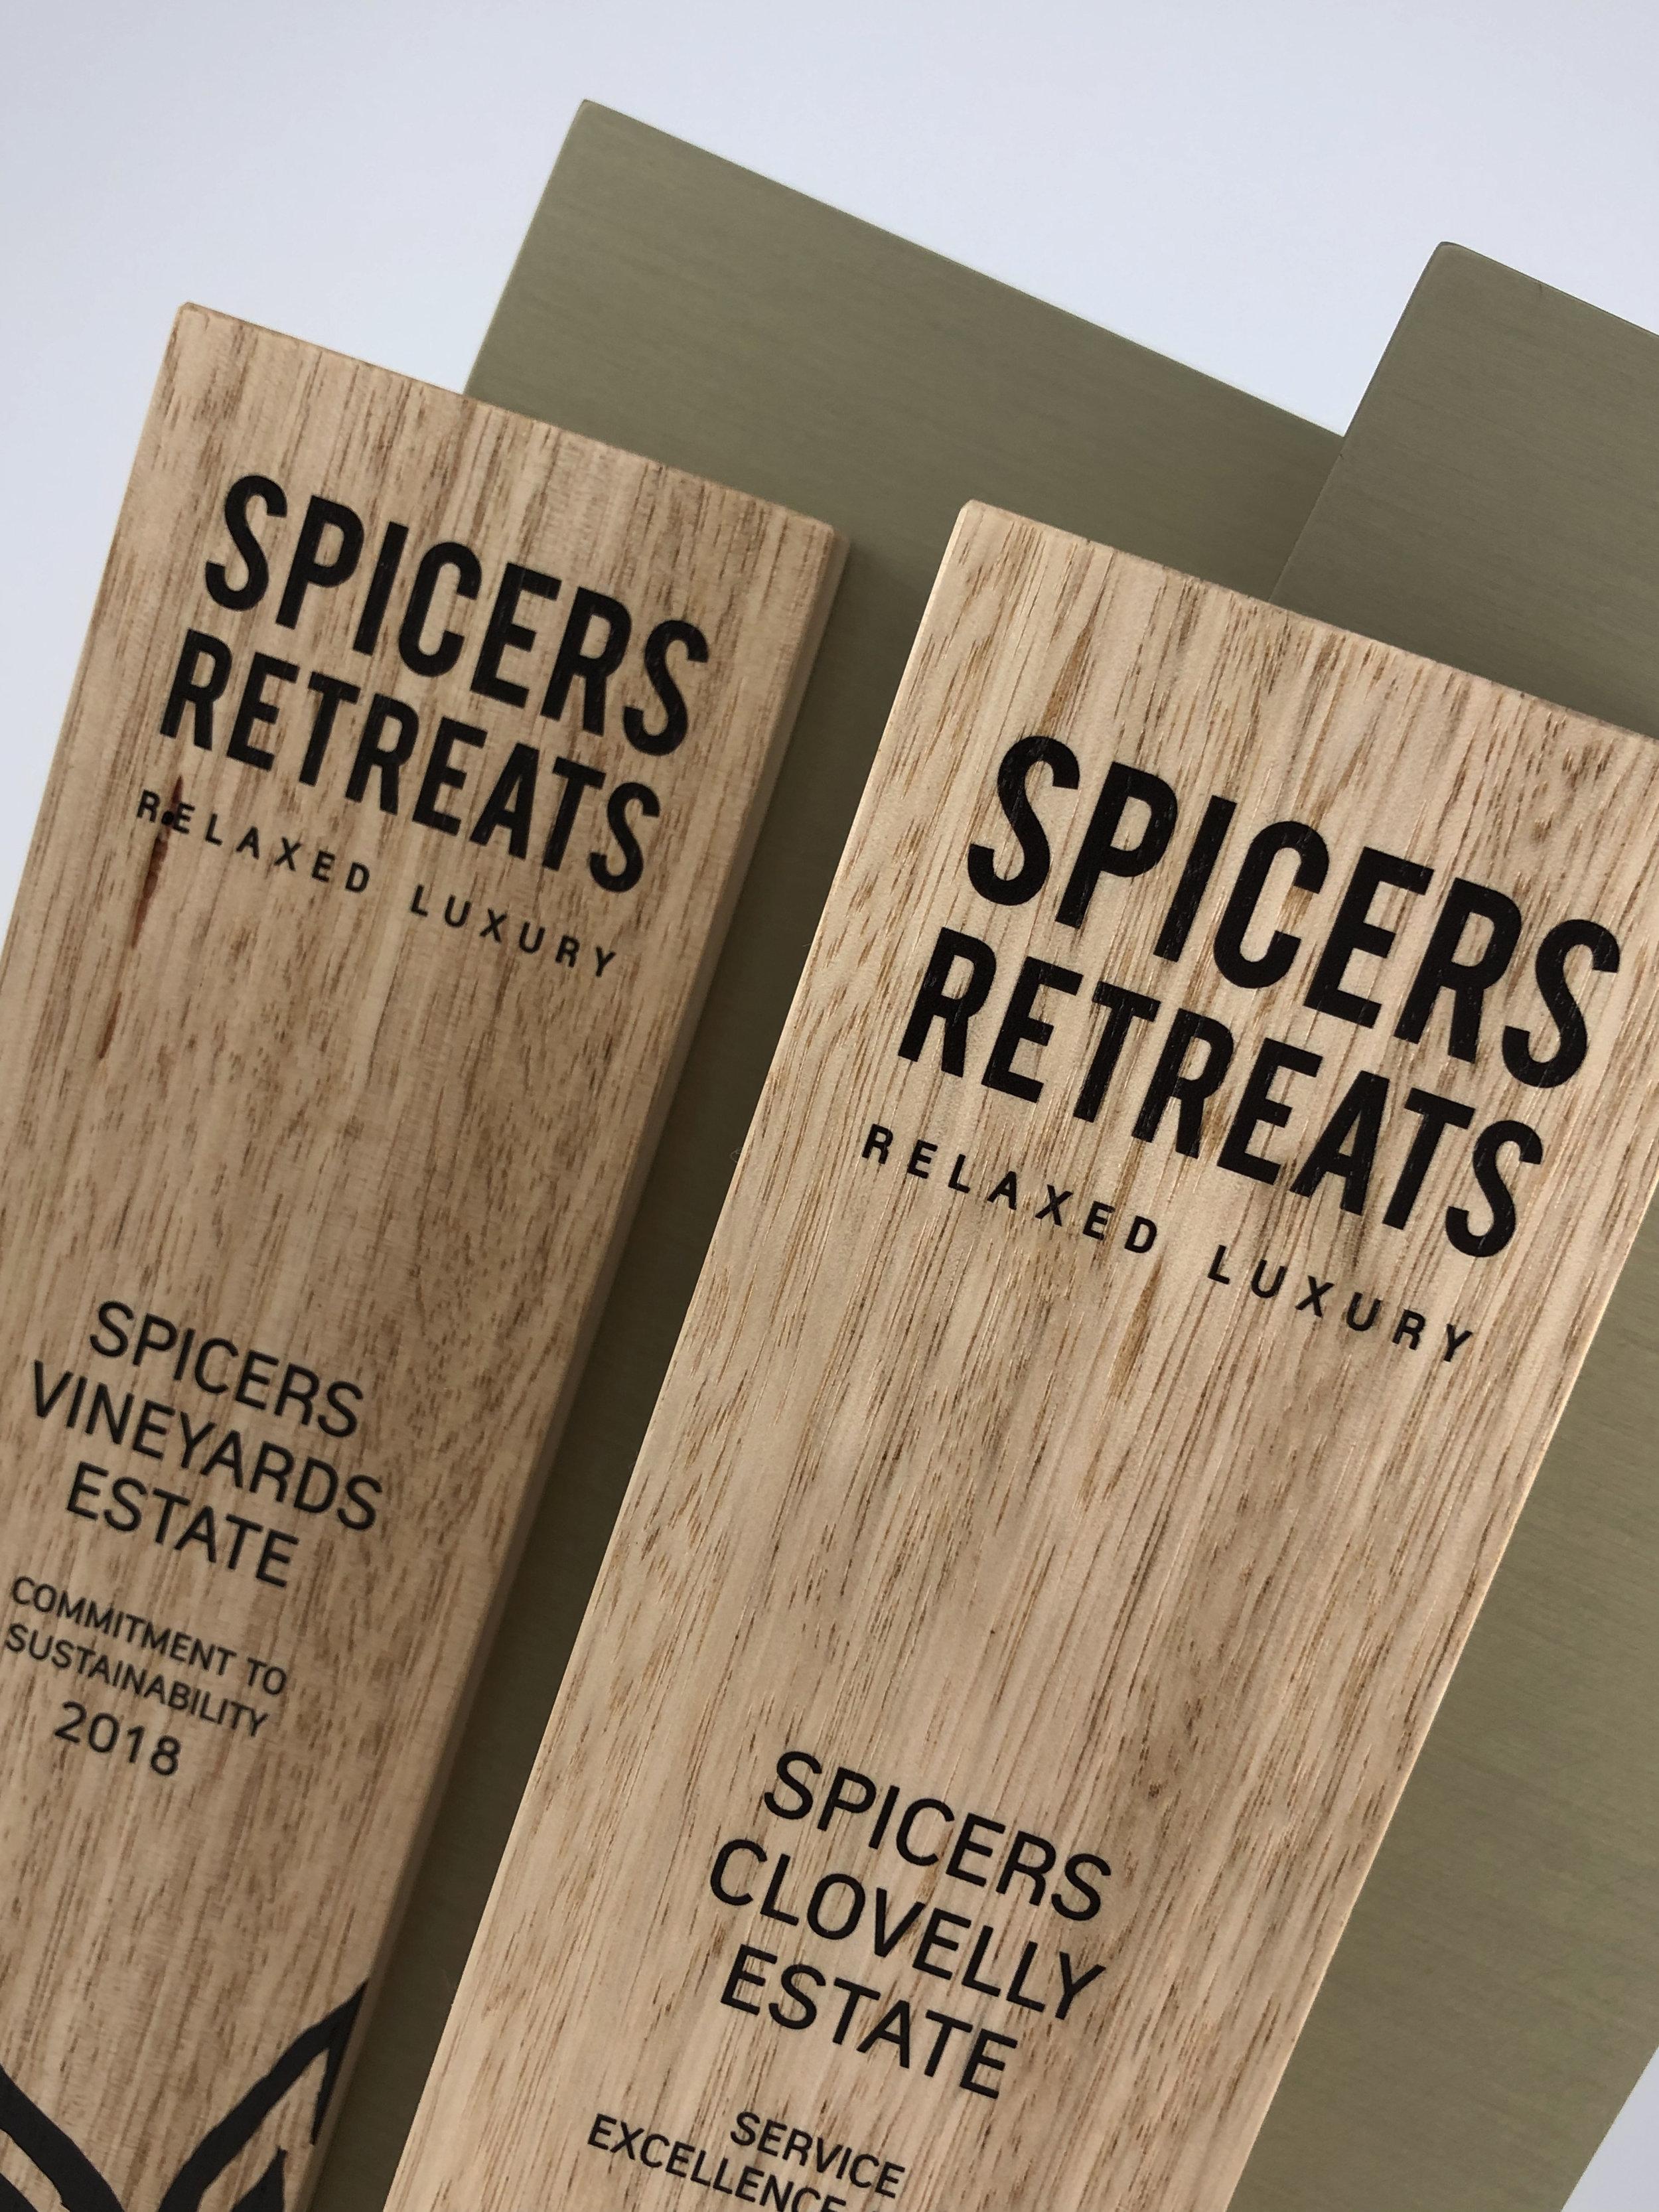 spicers-retreat-awards-timber-metal-art-print-trophy-07.jpg